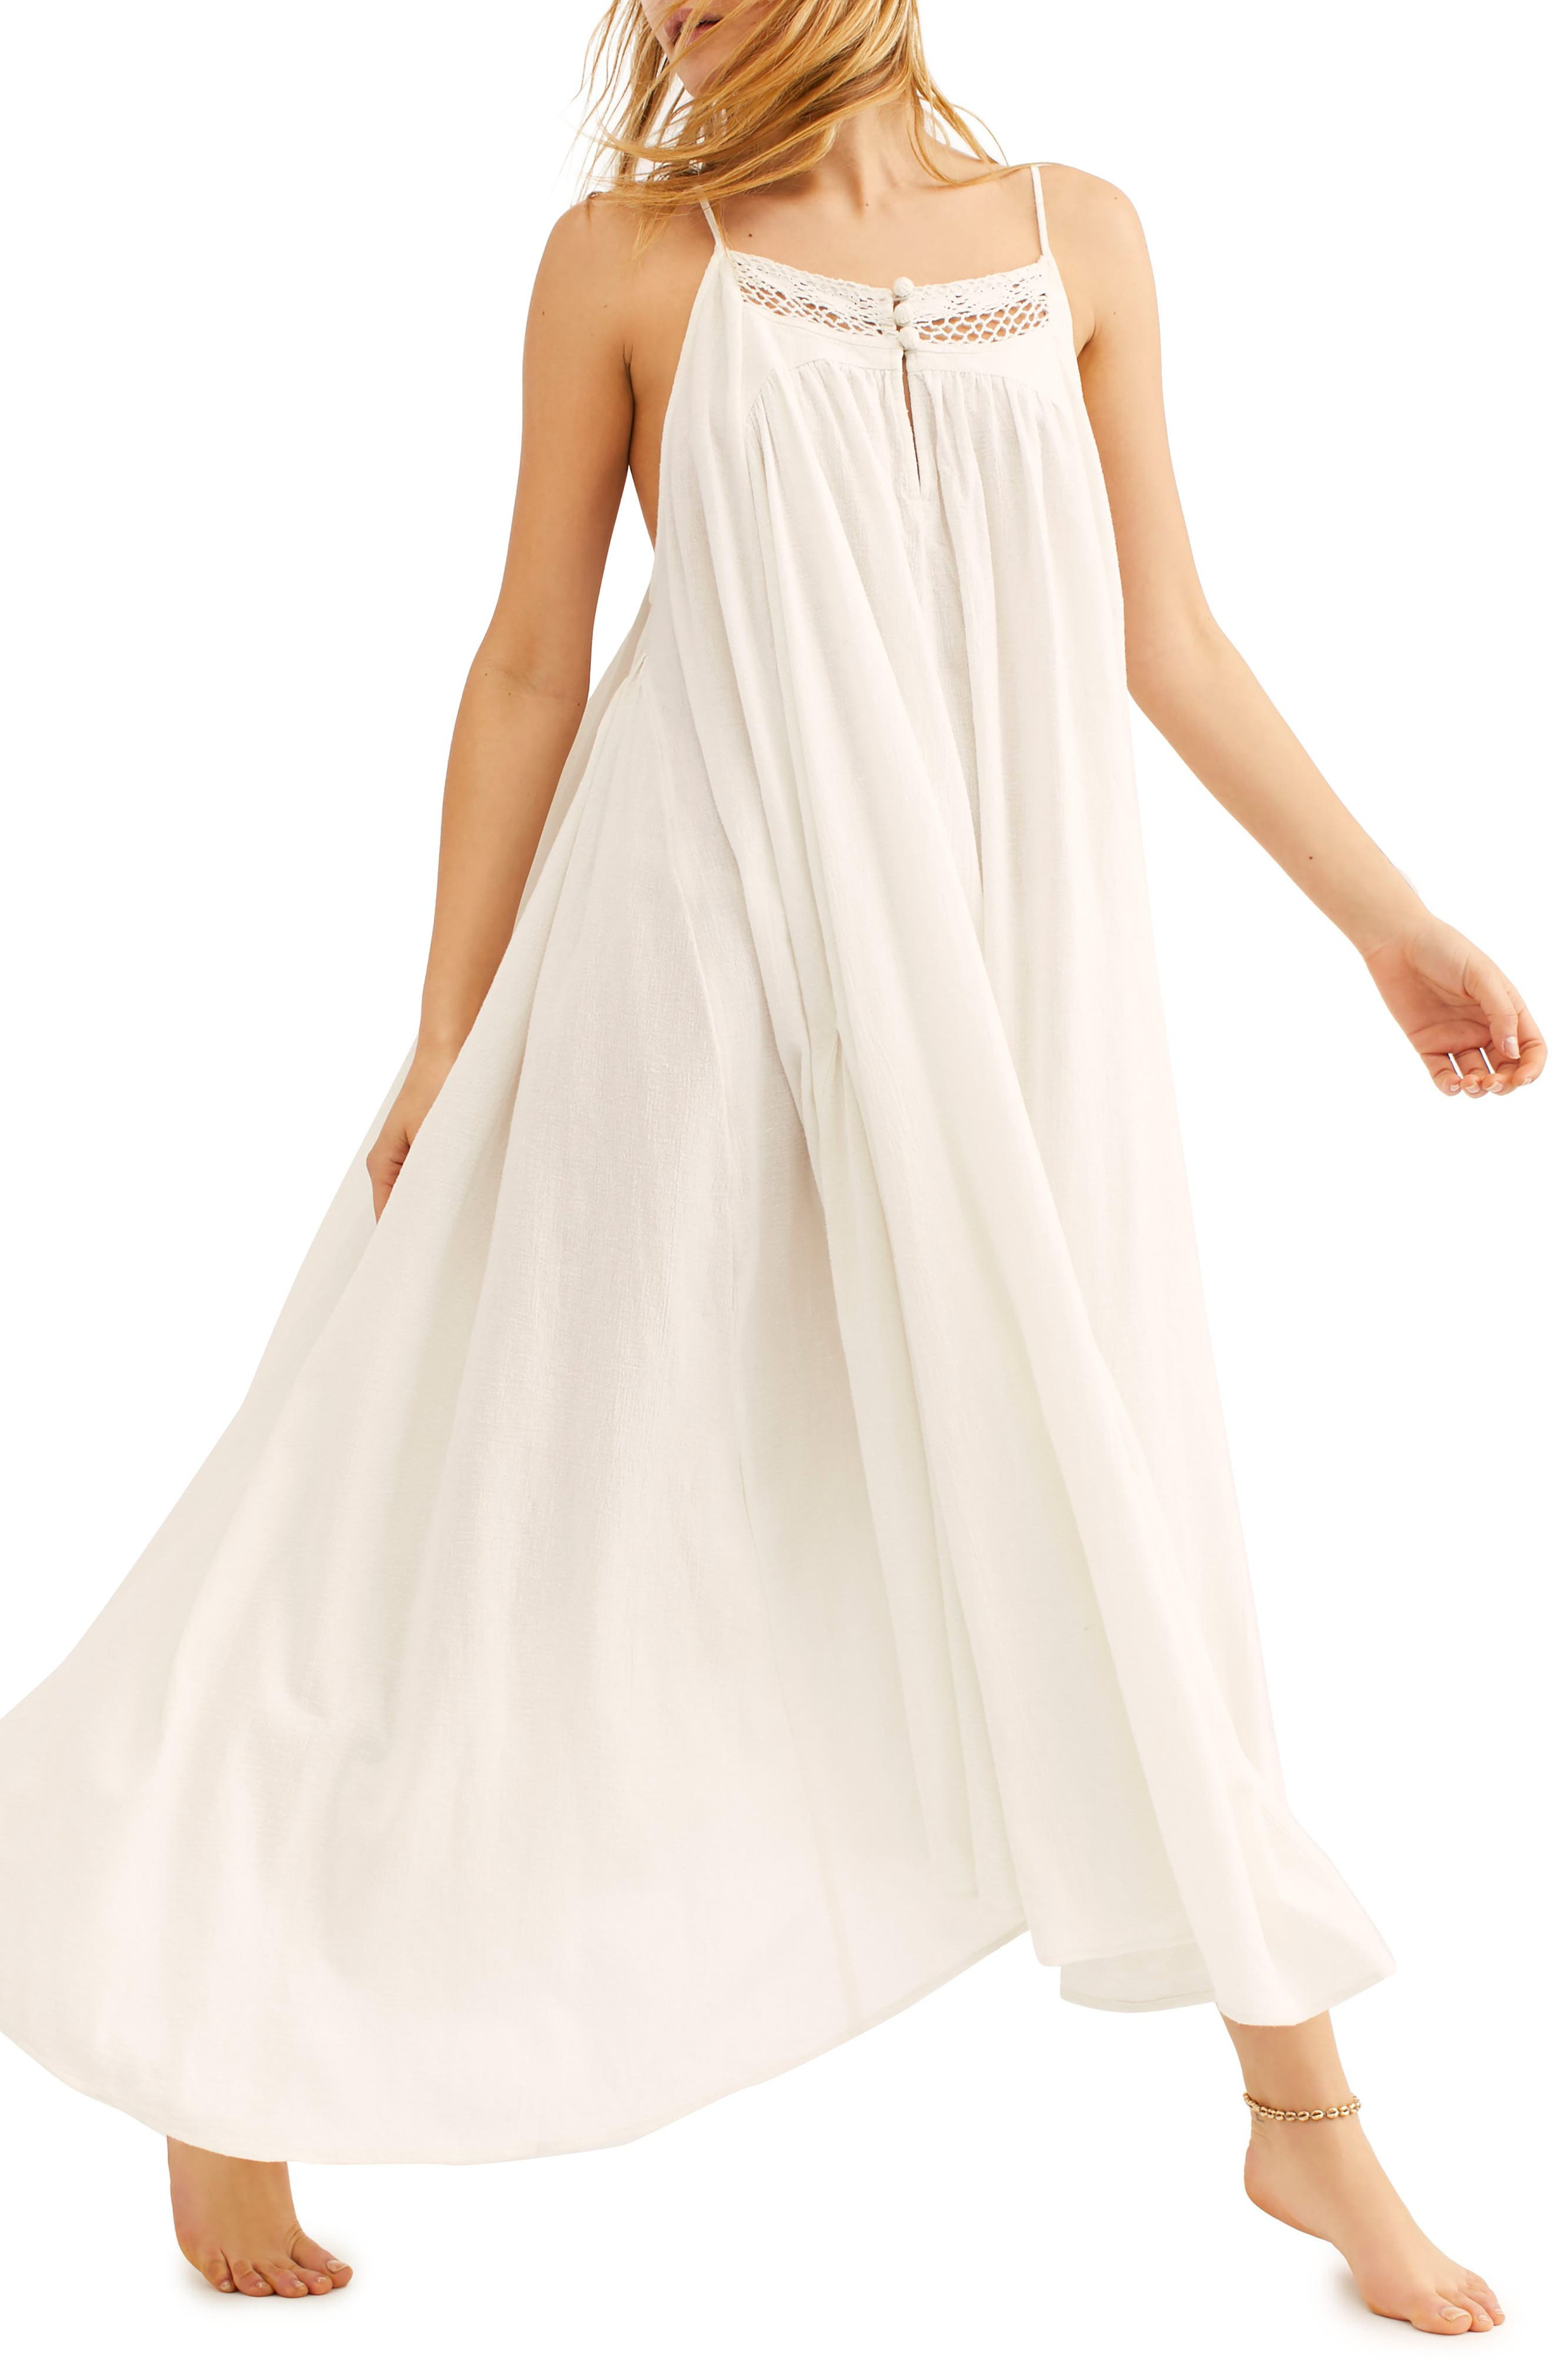 66441178894 Women's Free People Dresses   Nordstrom